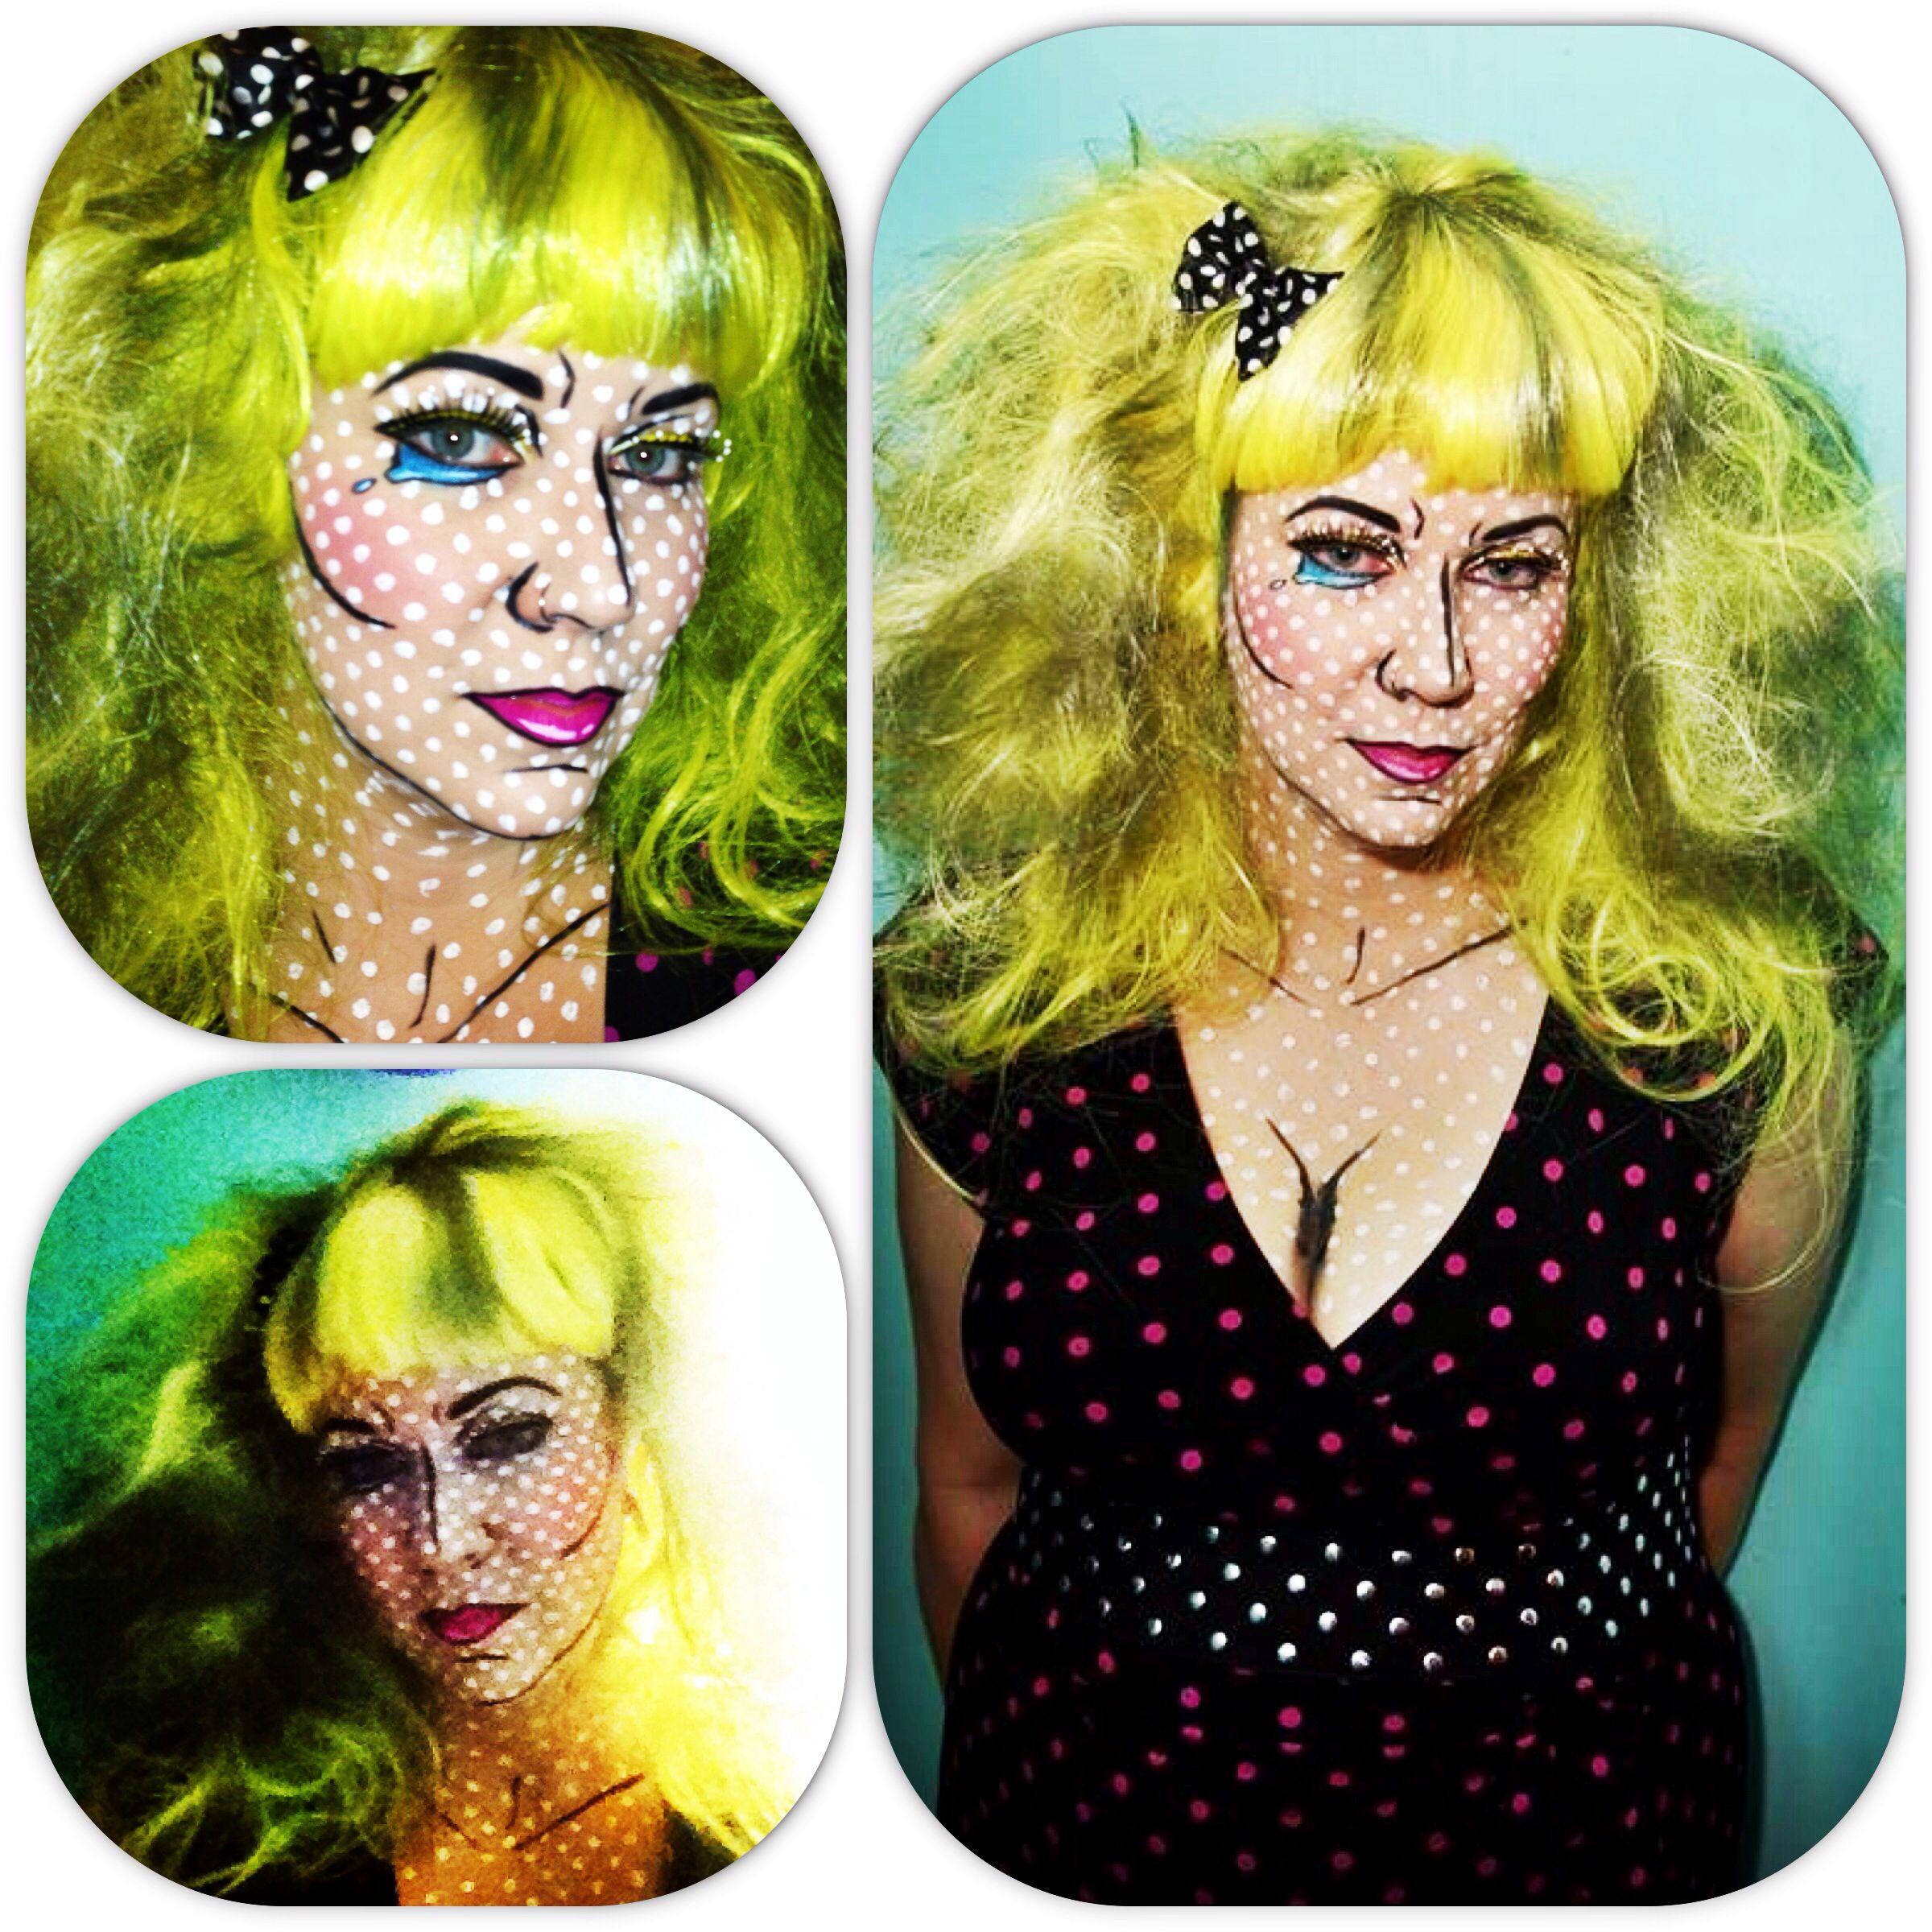 Lichtenstein comic book pop art halloween makeup look MAKE UP FOR EVER  Makeup by Melissa Nicholl www.stellardesignz.ca